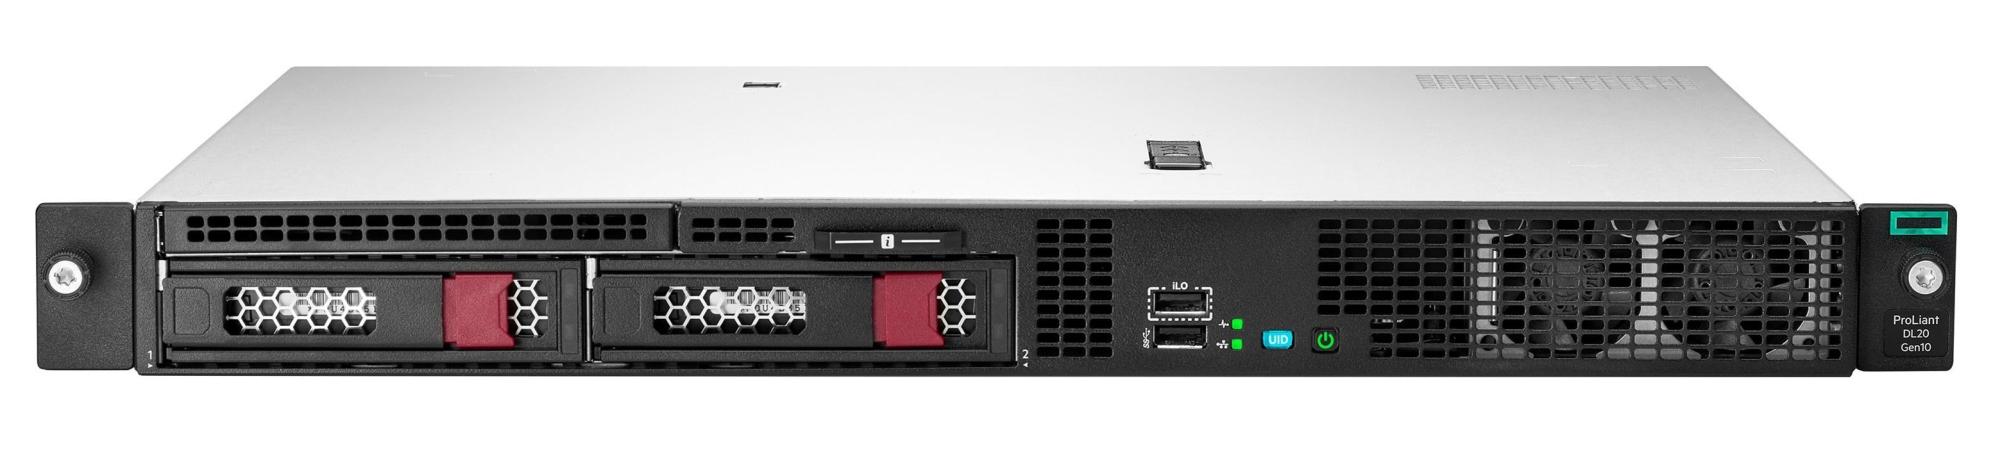 Proliant Dl20 Gen10 (perfdl20-005) + Windows Server 2019 Standard Servidor 3,4 Ghz Intel® Xeon® Bastidor (1u) 290 W